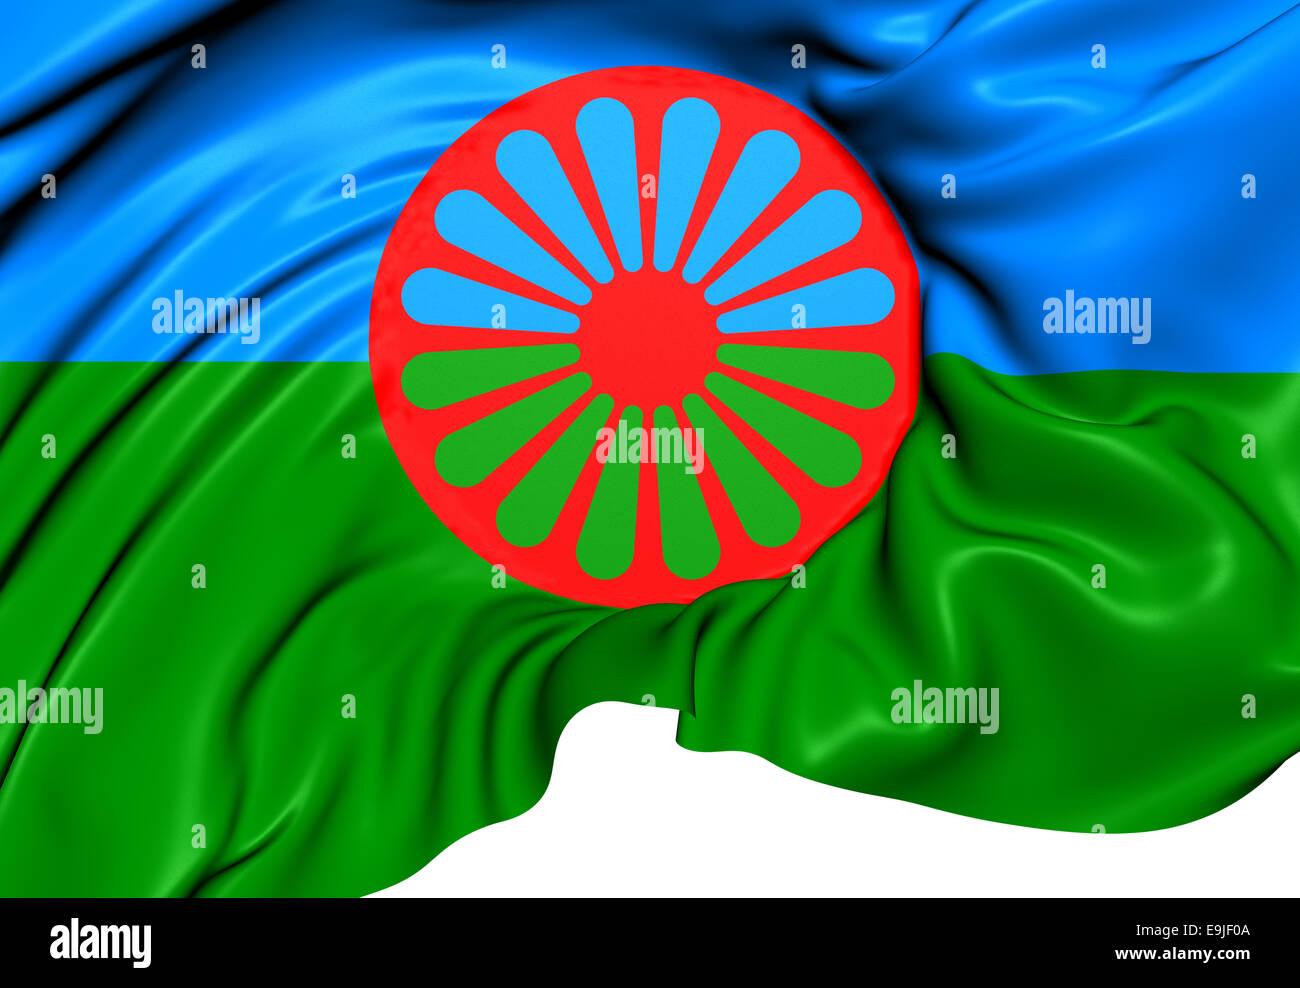 Roma-Flagge Stockfoto, Bild: 74780282 - Alamy